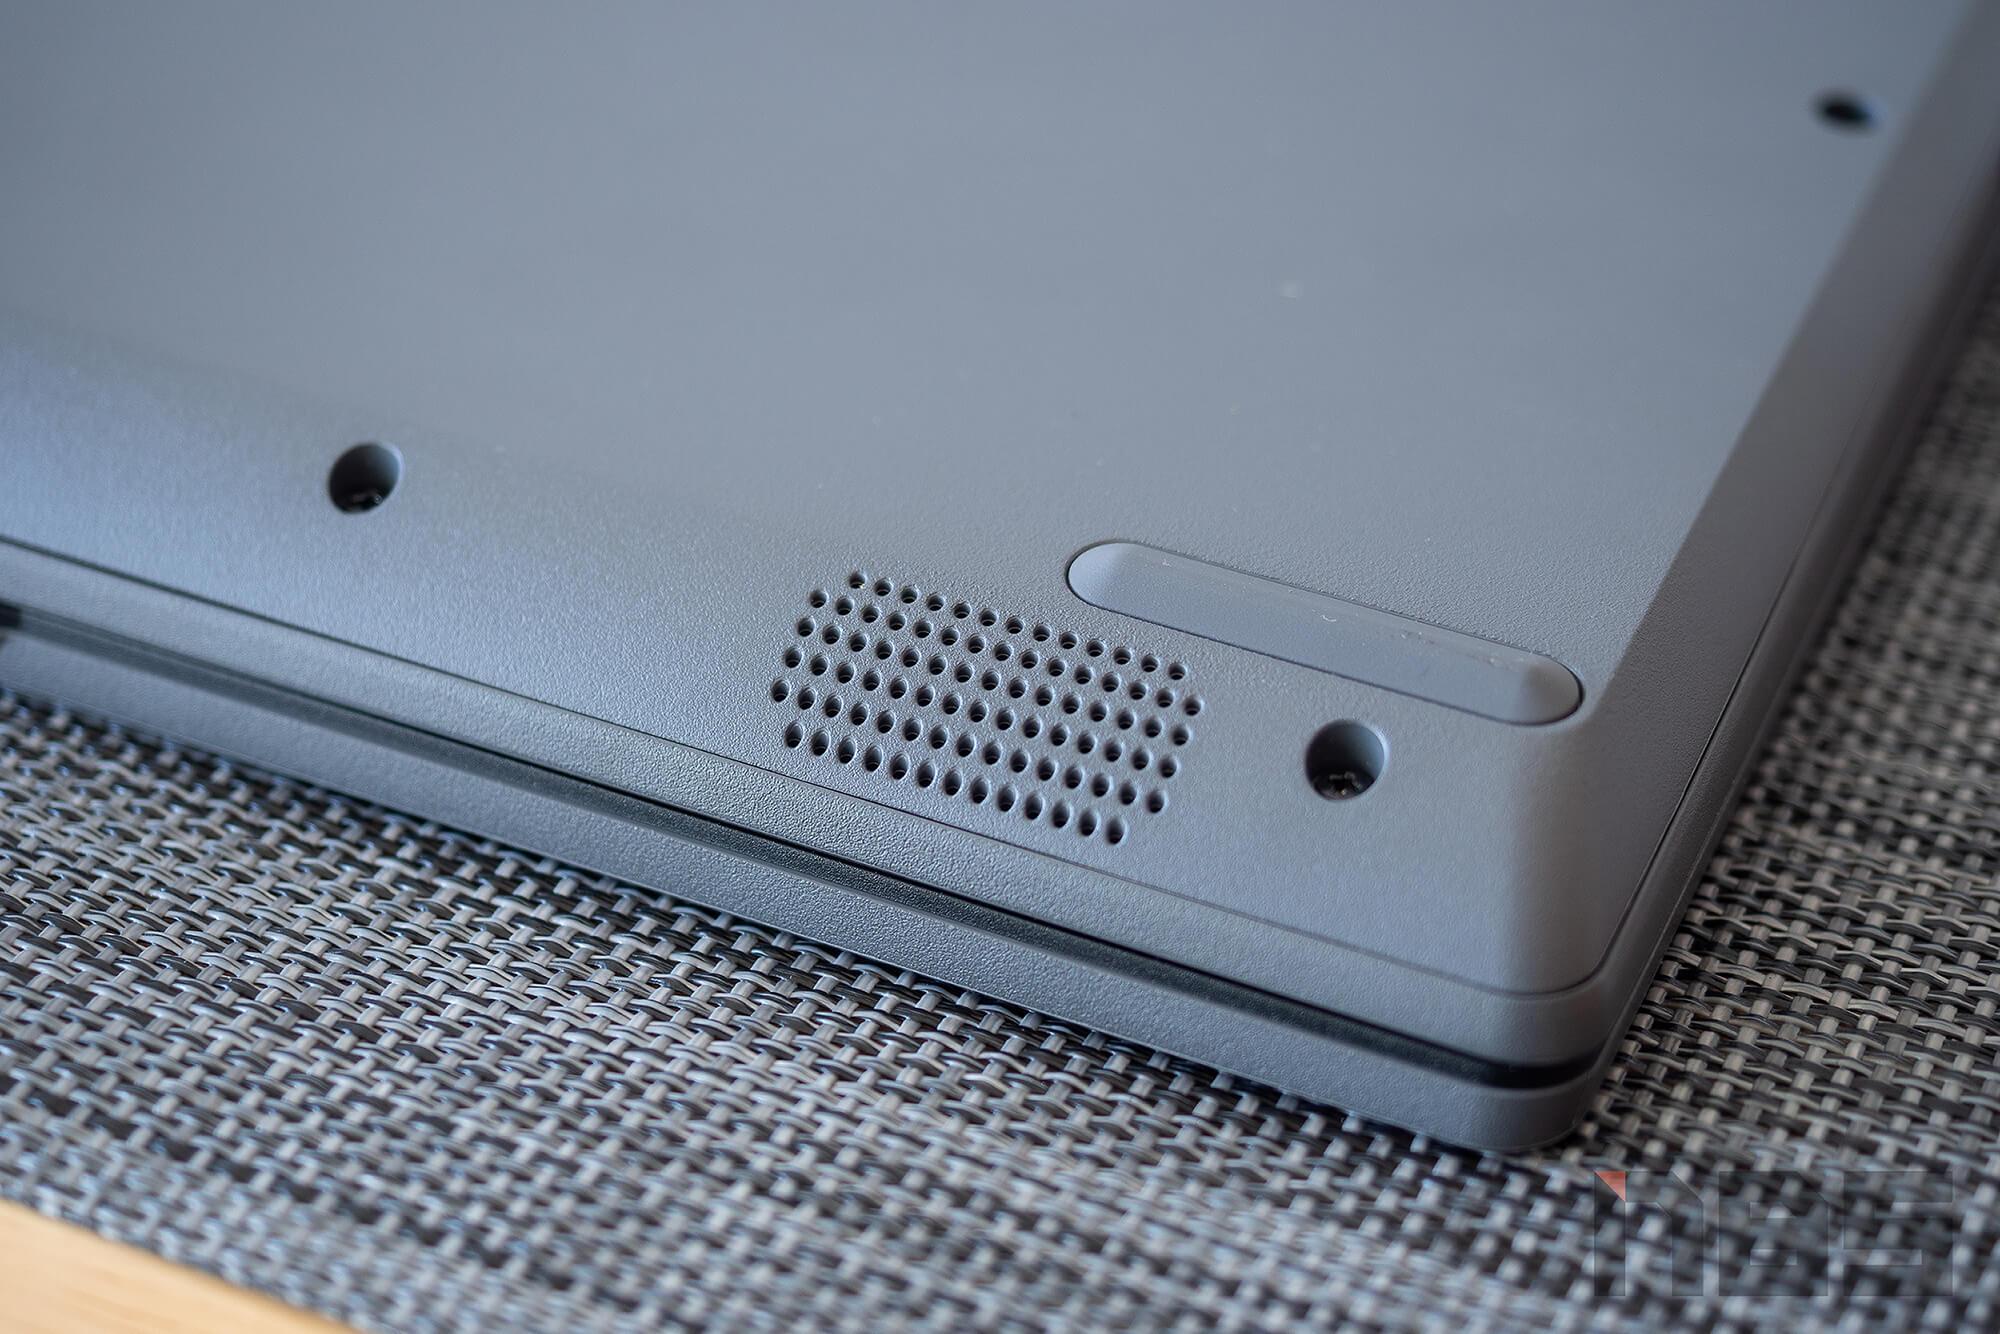 Review Lenovo IdeaPad Slim 3i pentium NotebookSPEC 05